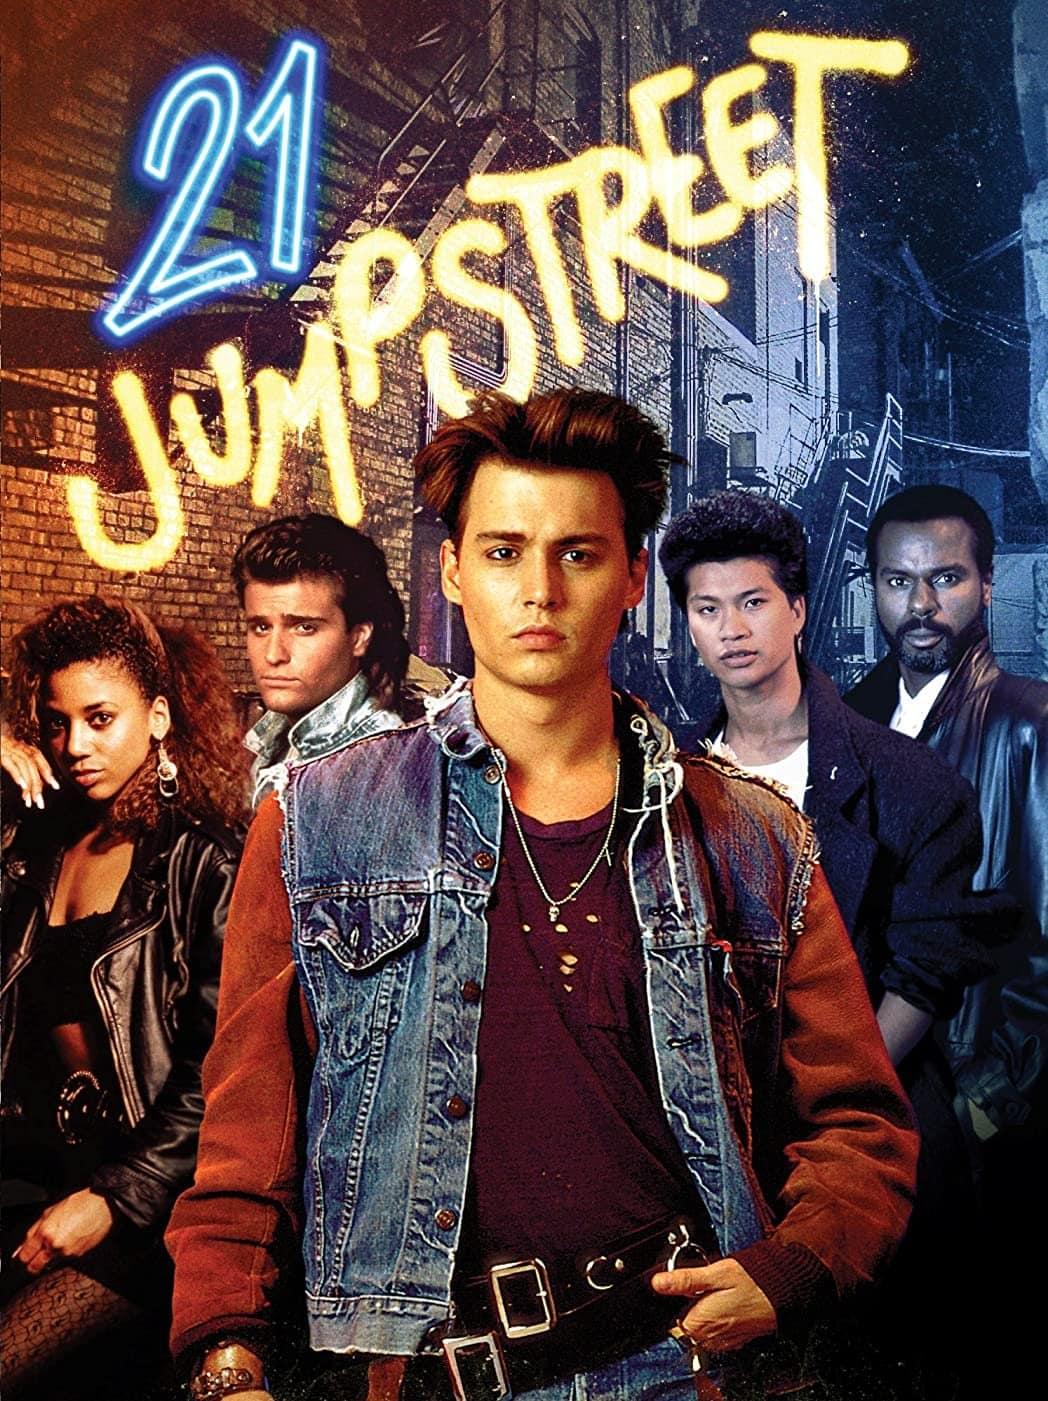 original 21 Jump Street TV series